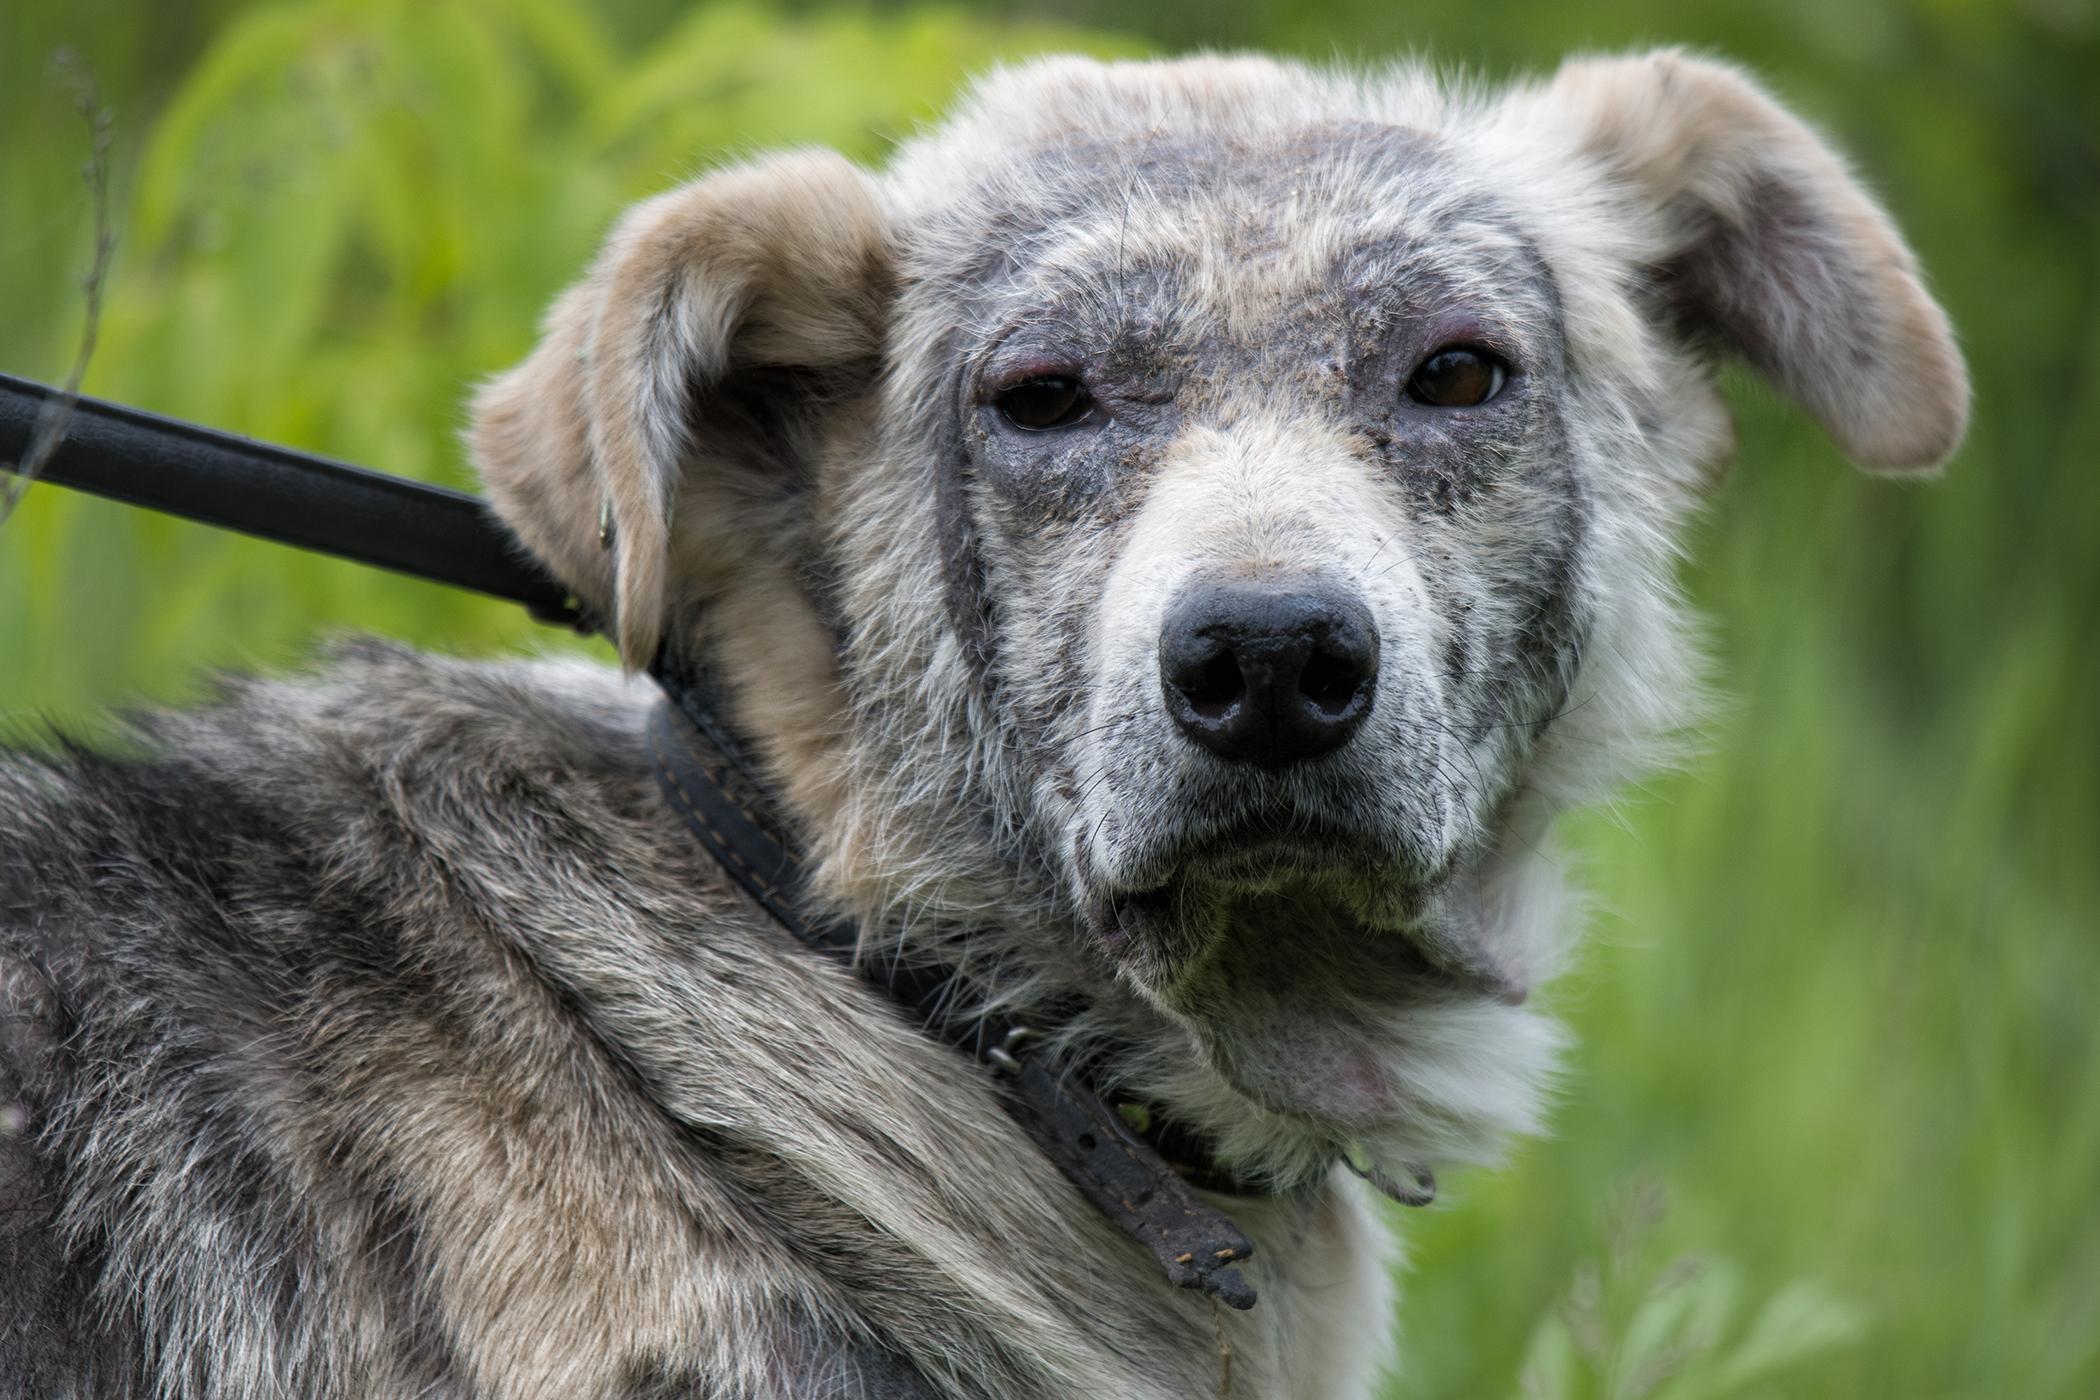 Sialoadenectomy in Dogs